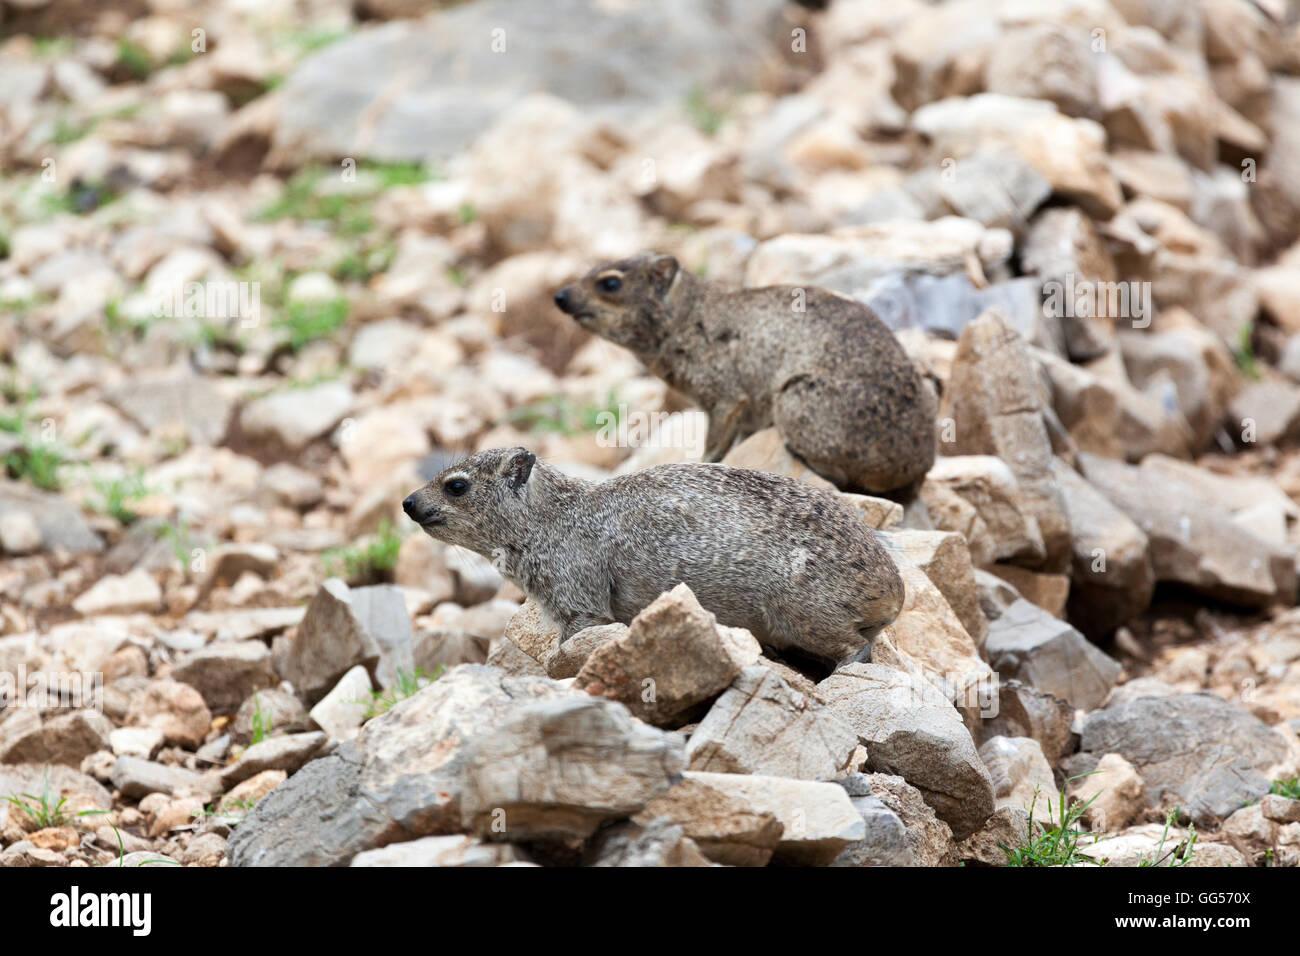 Namibia Rock Dassie, Rock Hyrax (Procavia capensis) near Etosha National Park - Stock Image